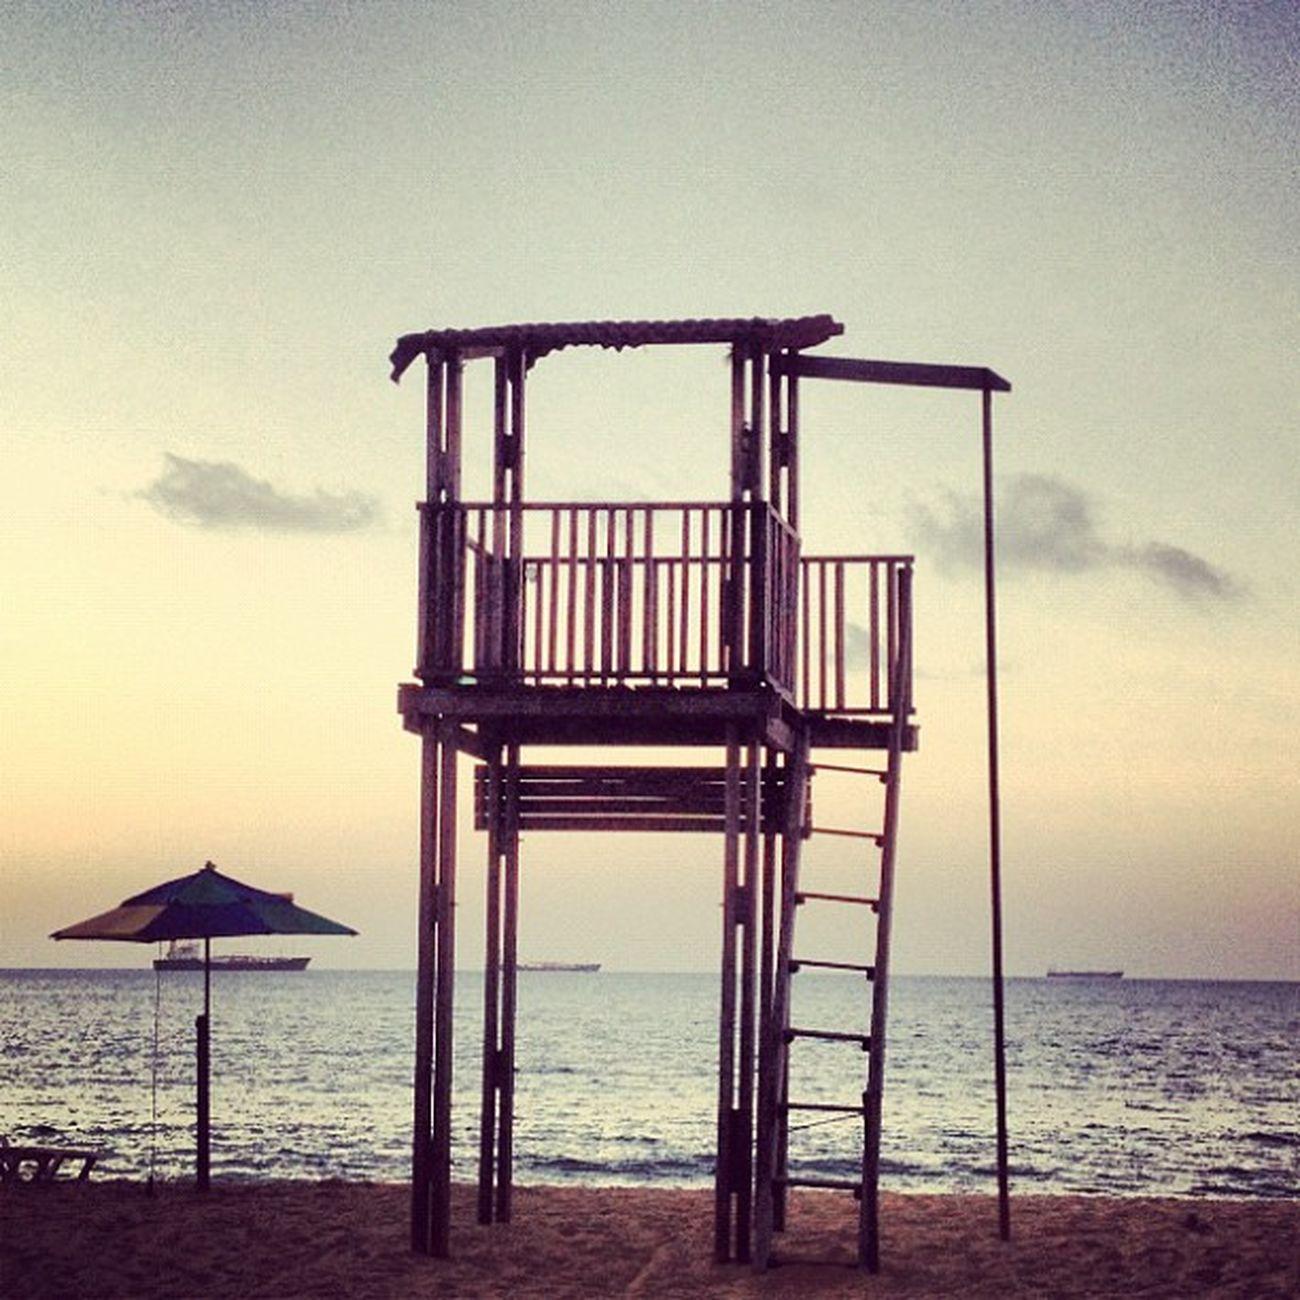 Cearaemfotos Igersfortaleza Igers Pollysanders Issovicia Igersdizquefuiporai Sunset Beach